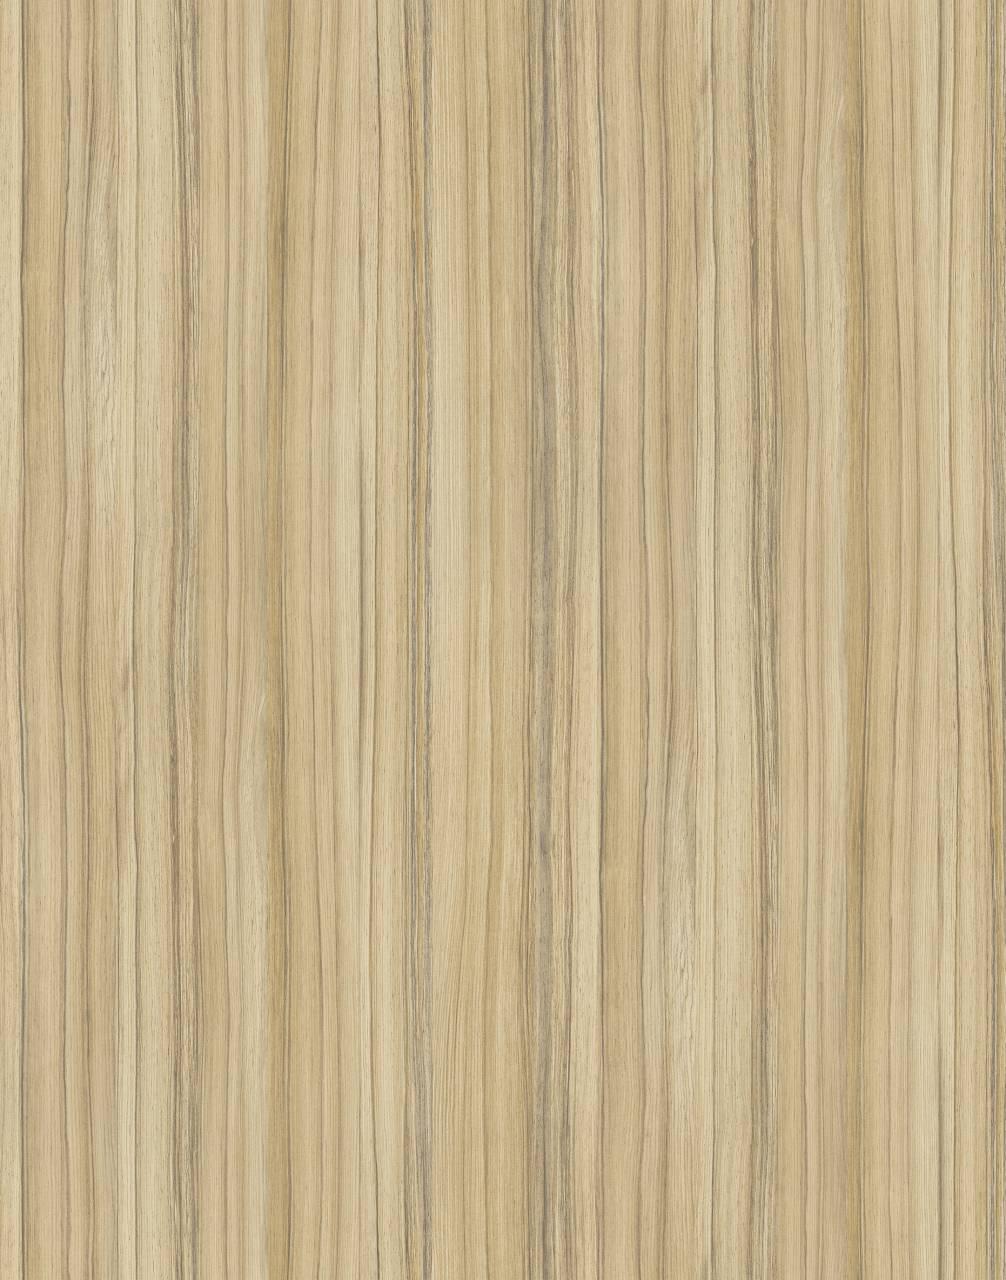 8995 Coco Bolo (мостра ЛПДЧ)